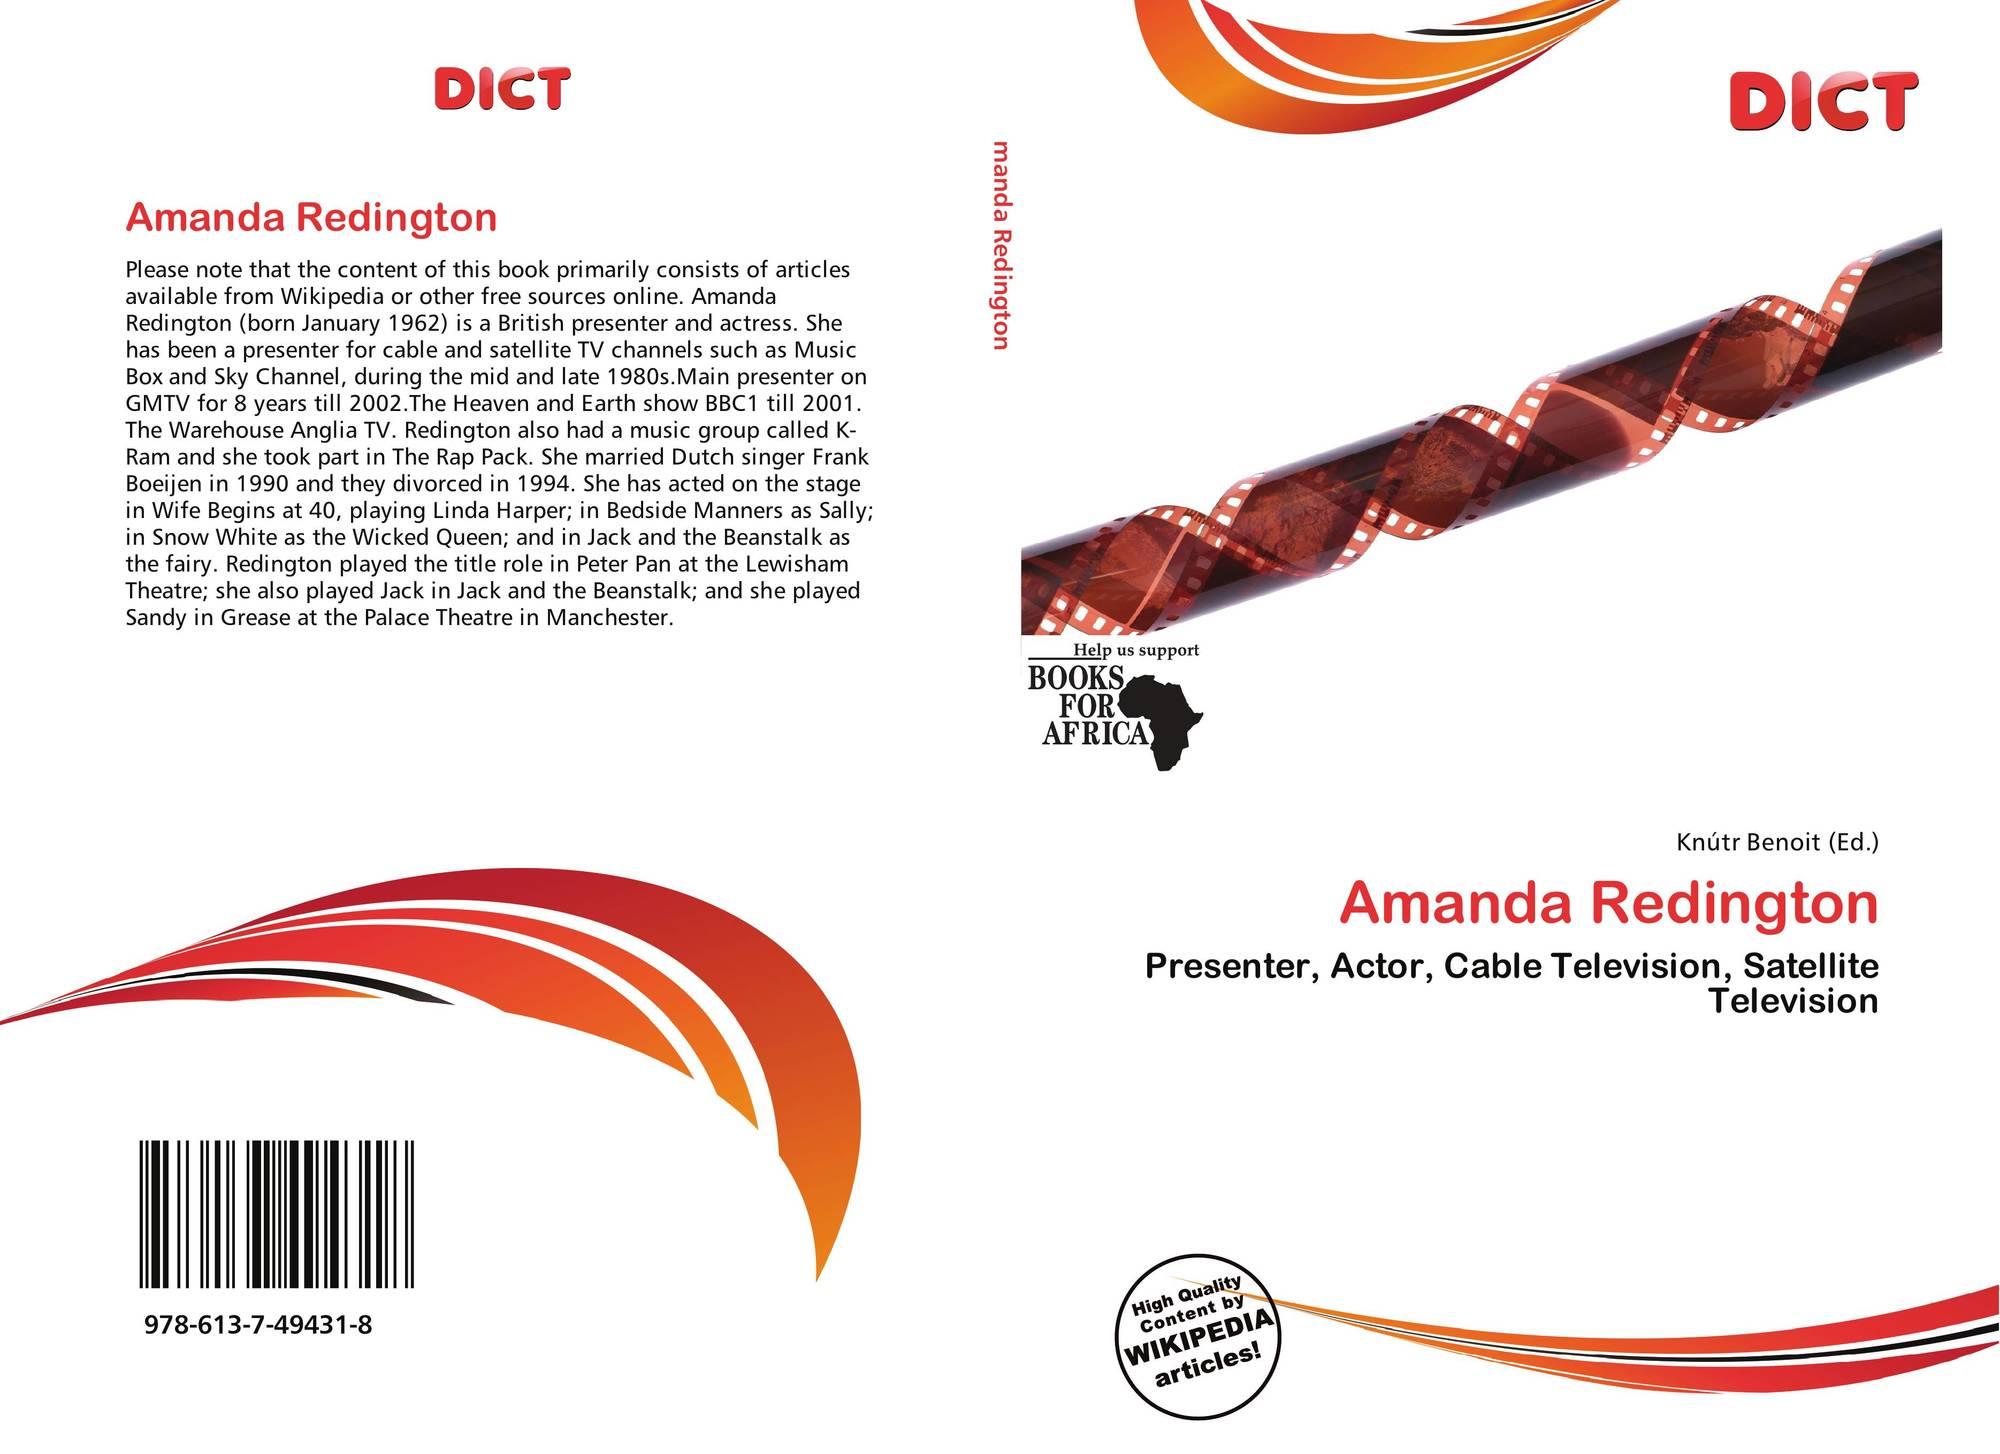 Amanda Redington amanda redington, 978-613-7-49431-8, 6137494314 ,9786137494318